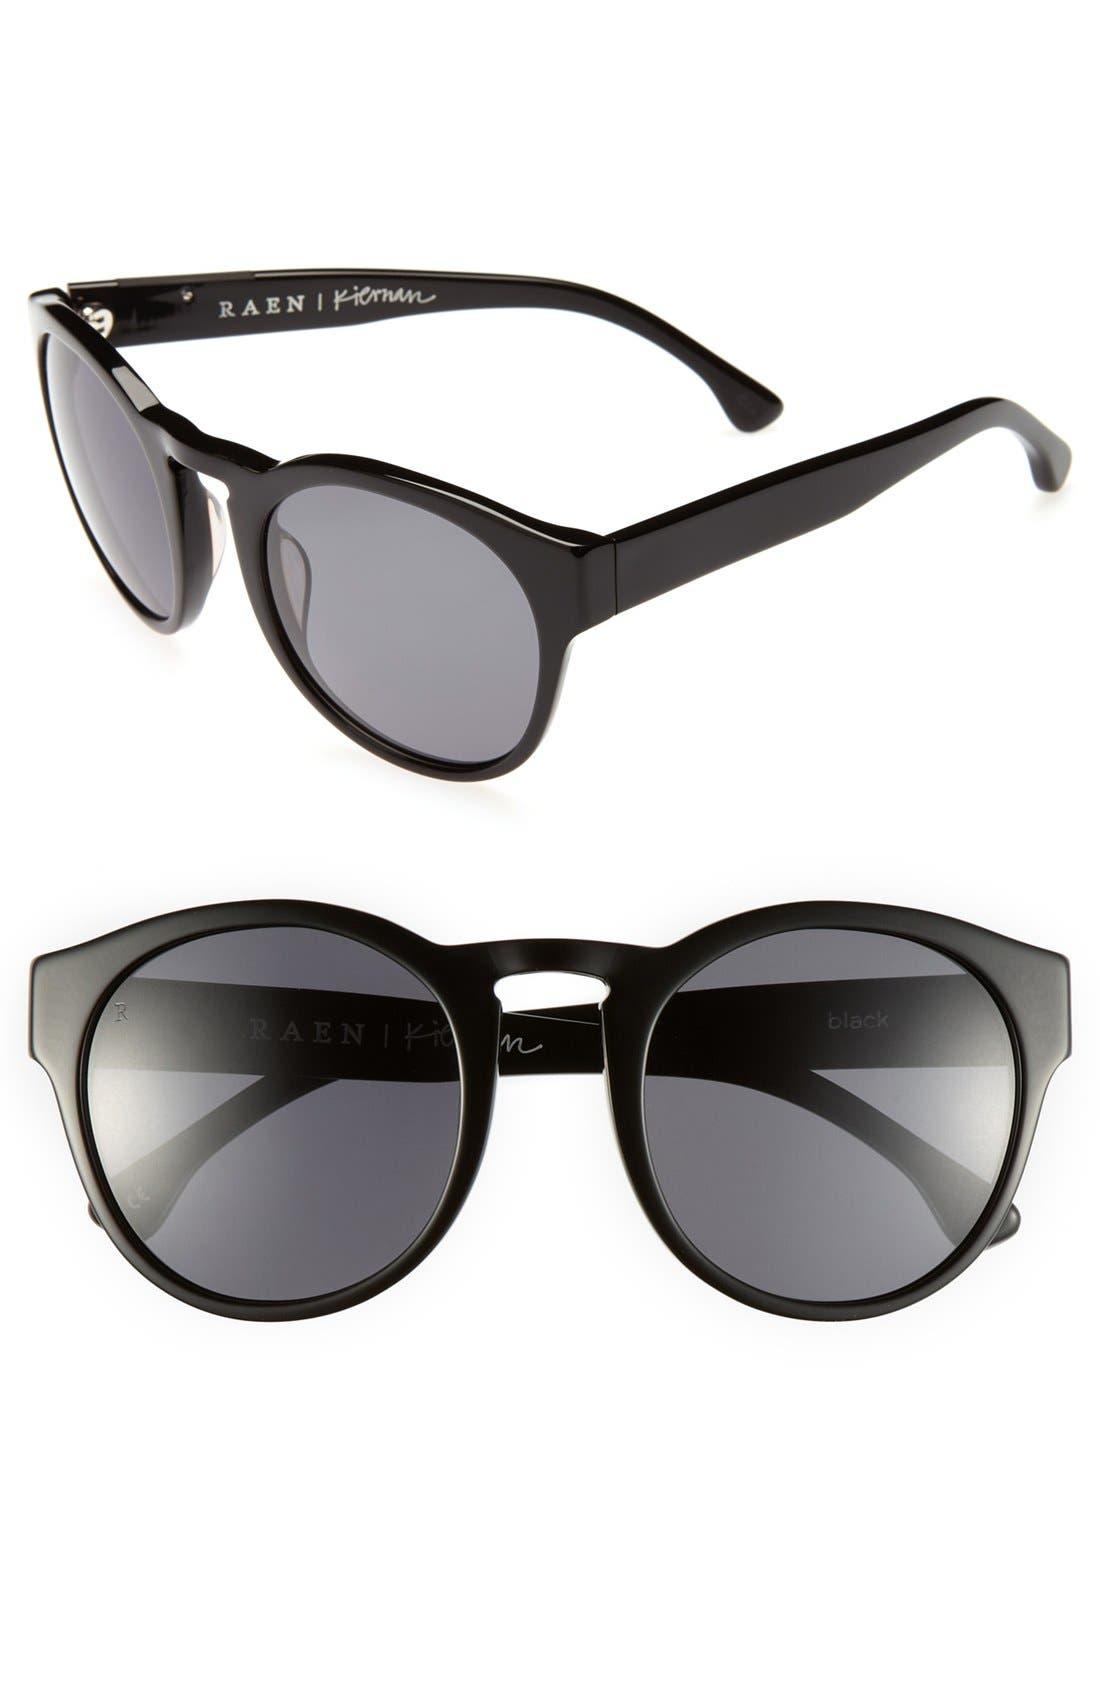 Alternate Image 1 Selected - RAEN 'Kiernan' 46mm Polarized Sunglasses